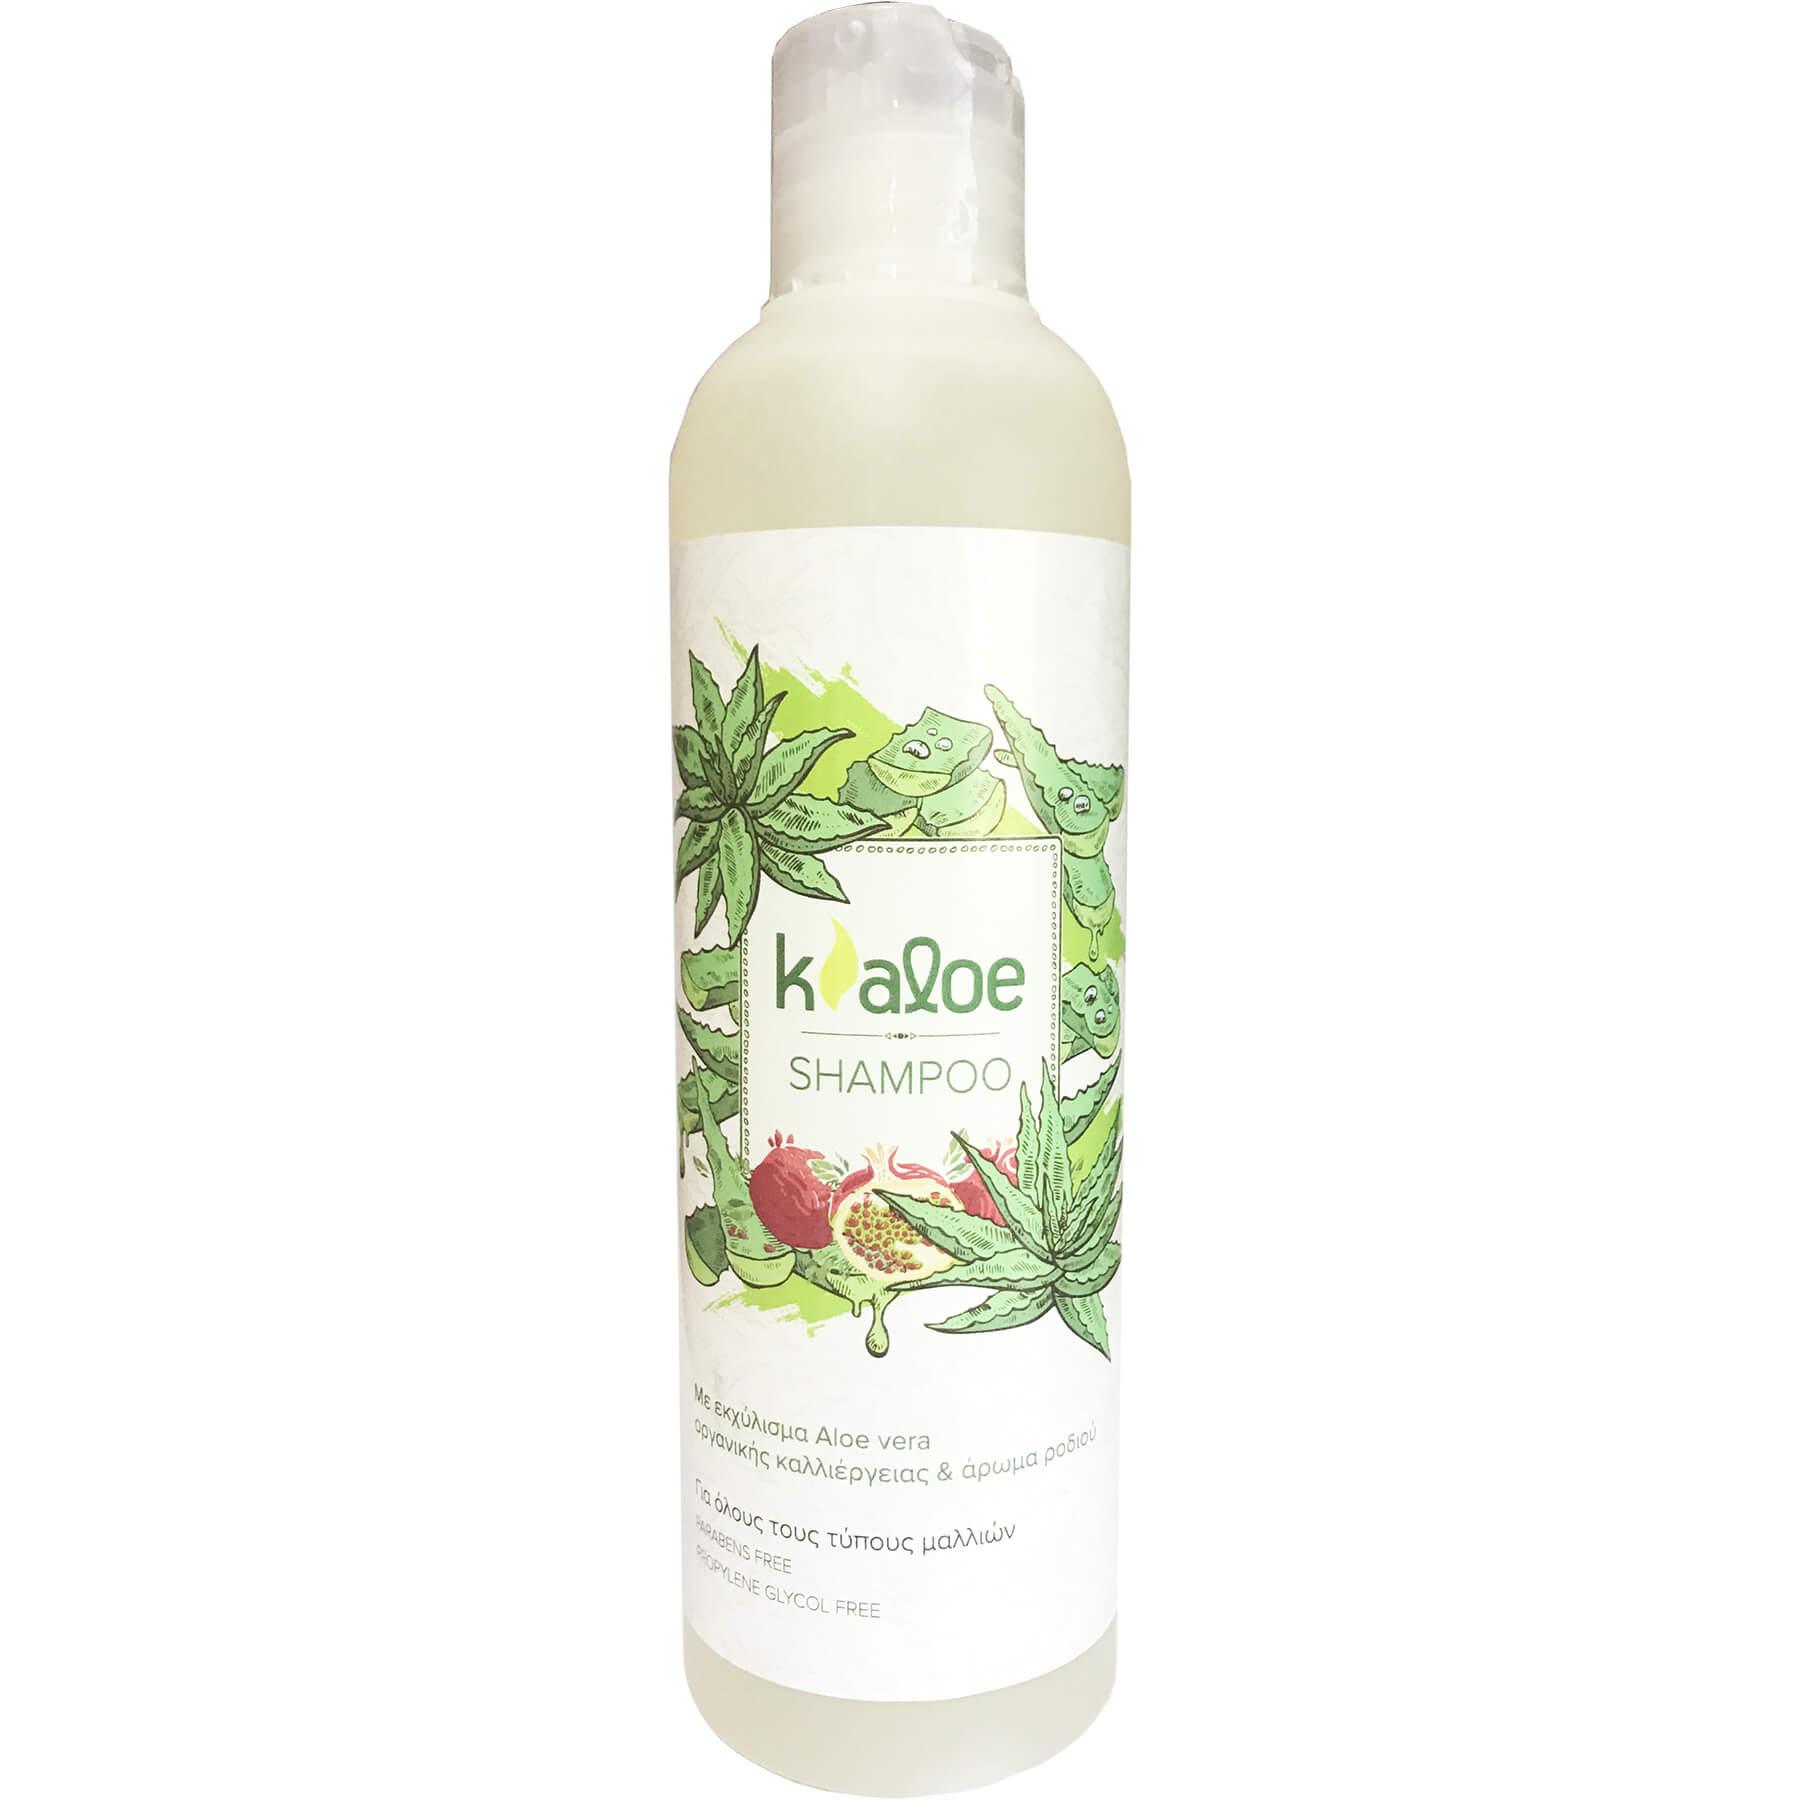 Kaloe Shampoo Σαμπουάν με Αλόη Bέρα & Ρόδι για Όλους τους Τύπους Μαλλιών 250ml